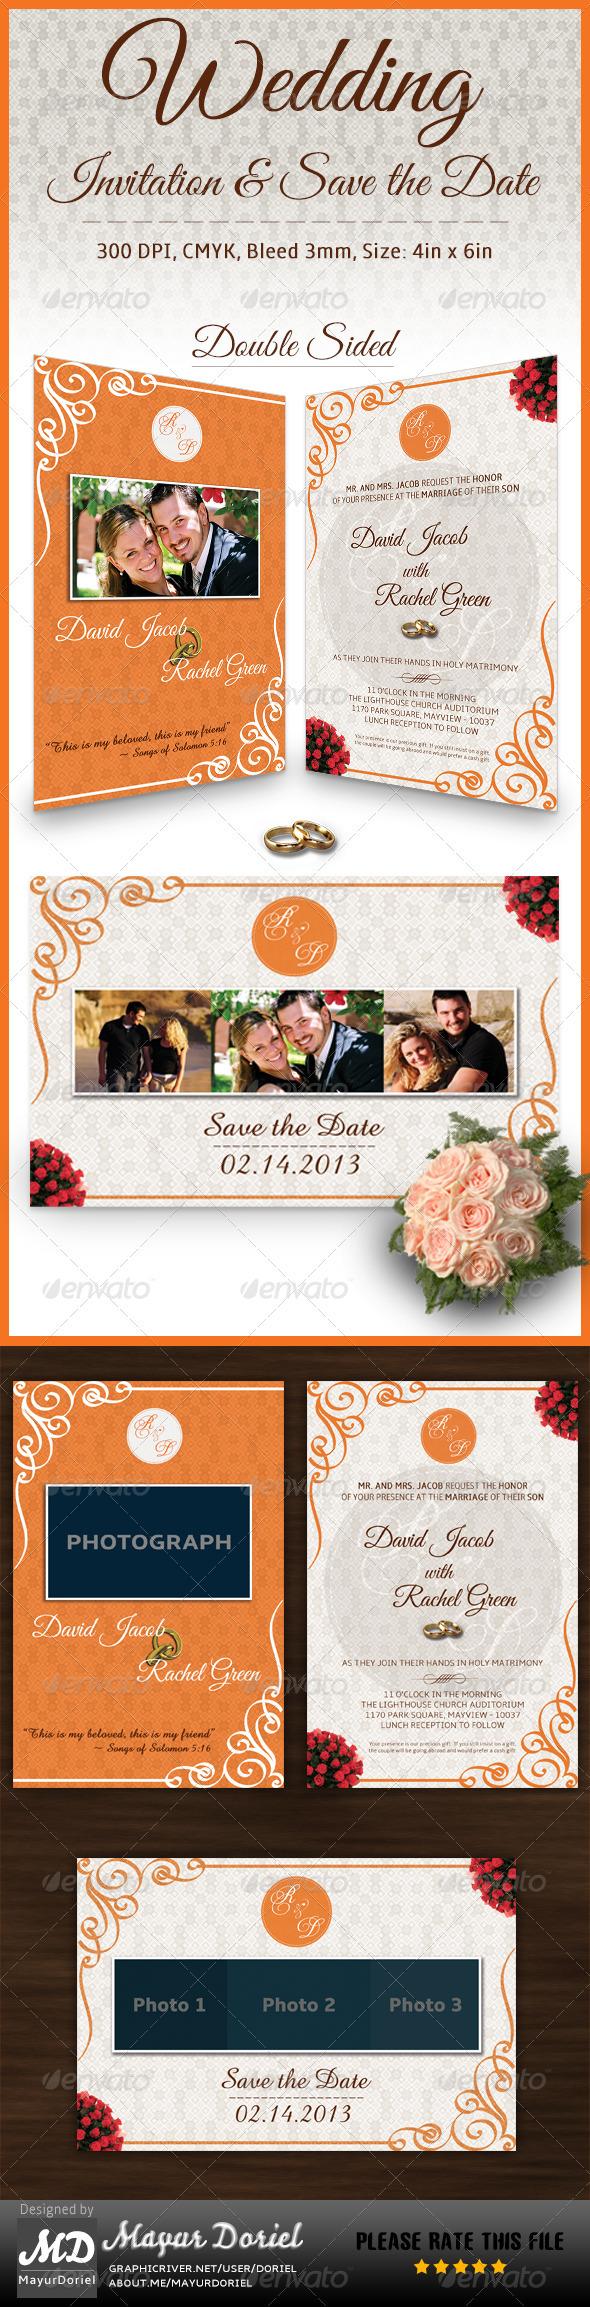 Wedding Invitation Card & Save the Date - Invitations Cards & Invites